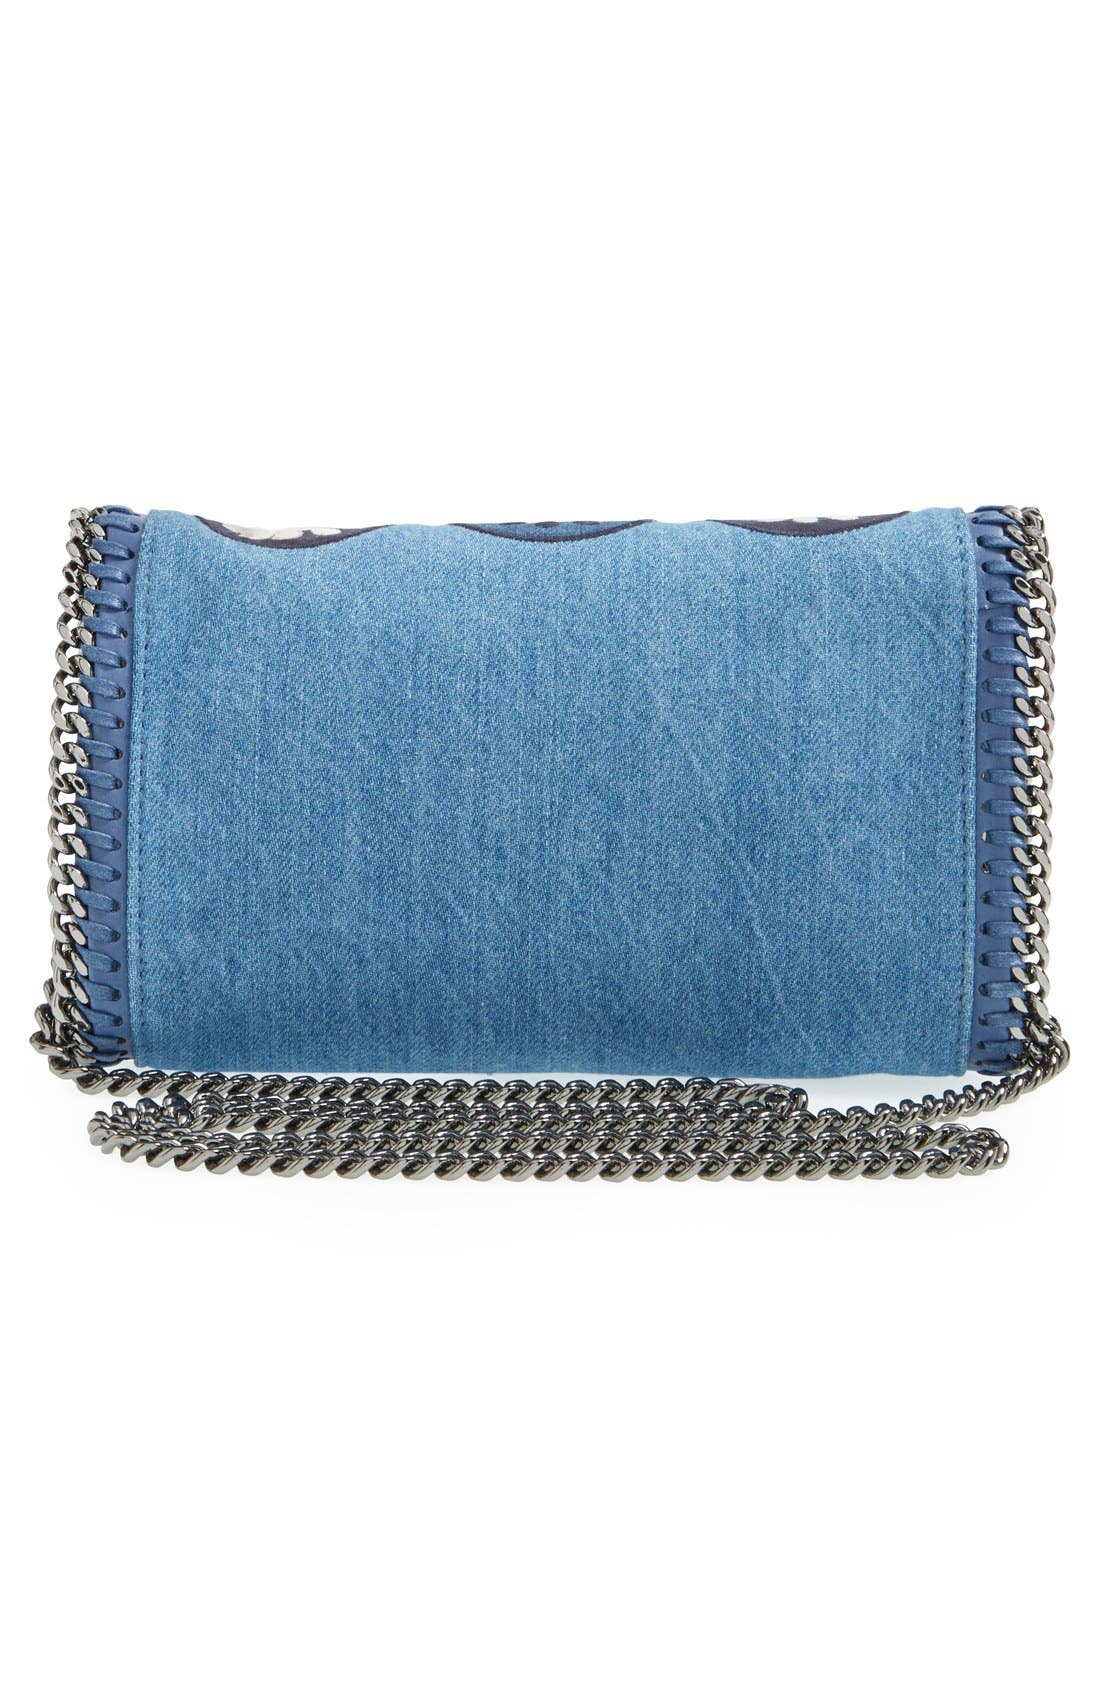 Alternate Image 3  - Stella McCartney 'Falabella - Adorned' Denim Crossbody Bag